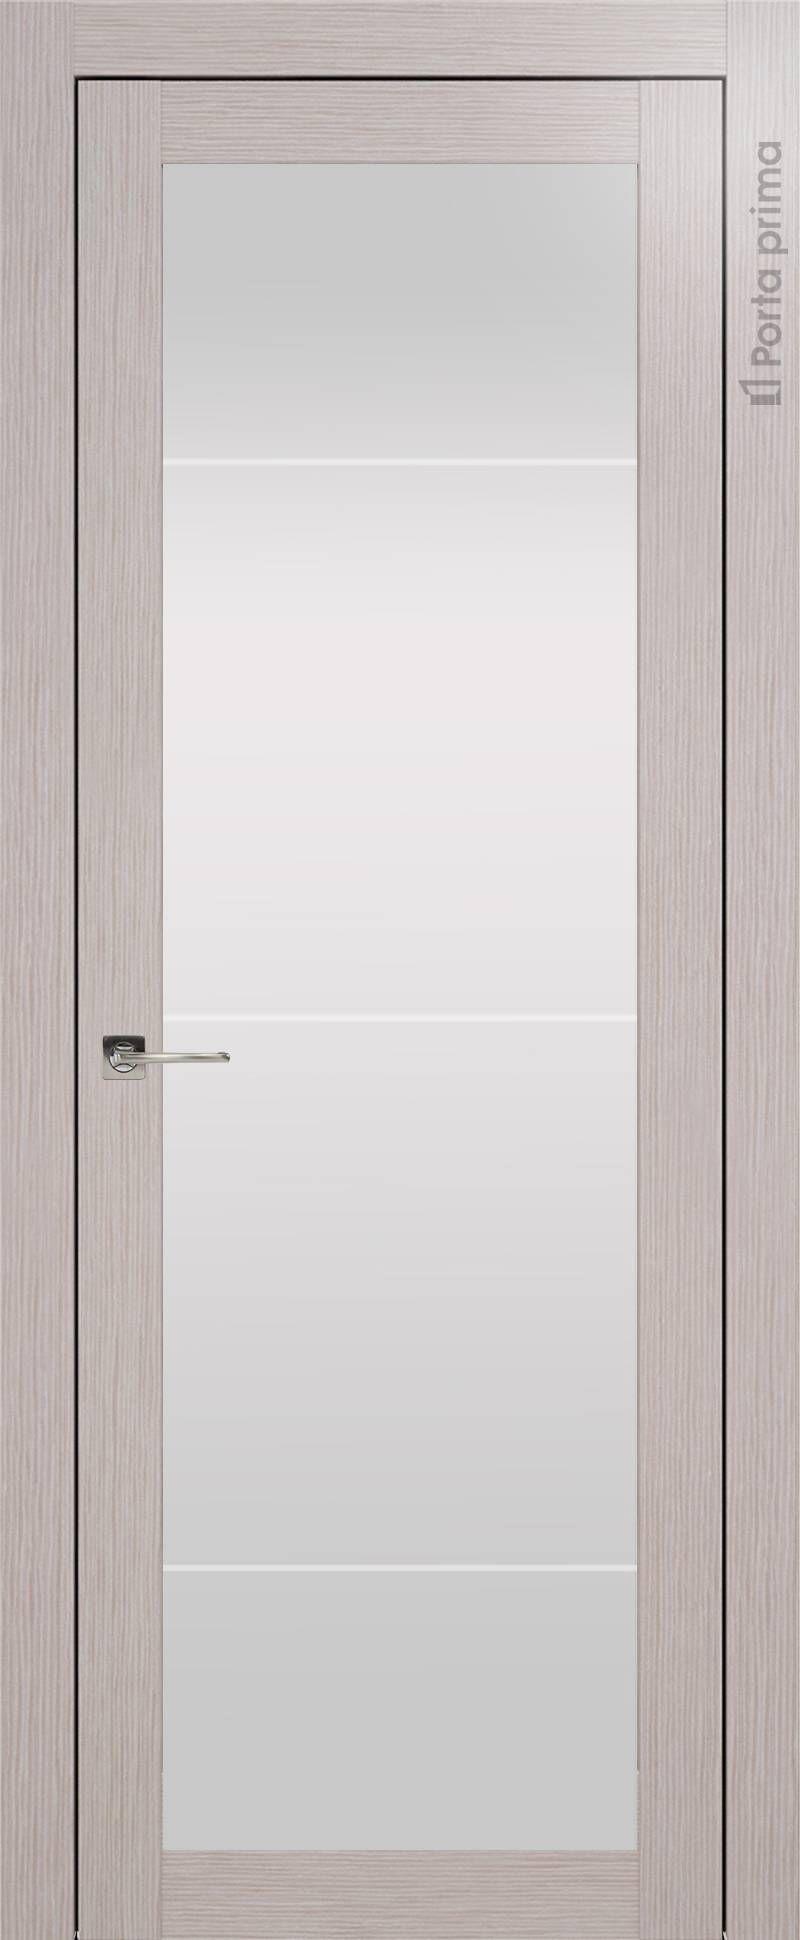 Tivoli З-3 цвет - Дымчатый дуб Со стеклом (ДО)